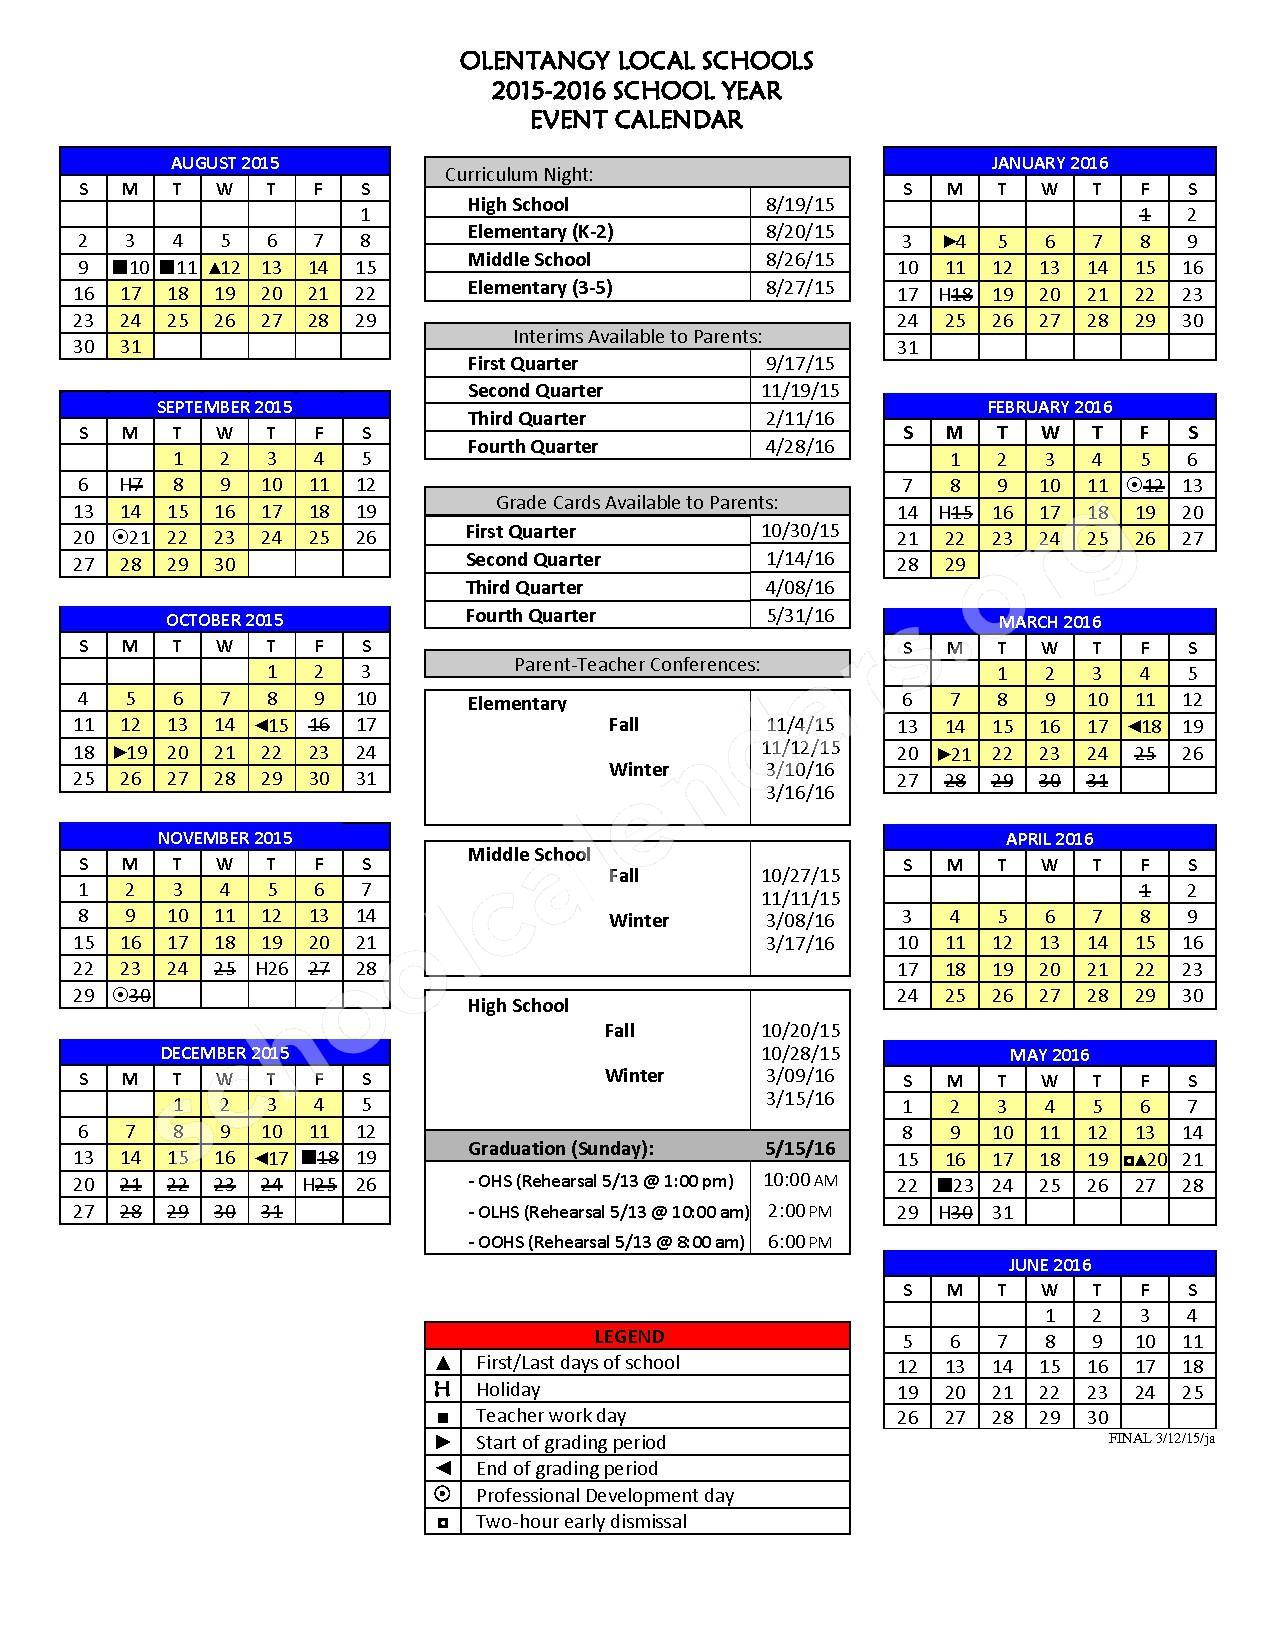 2015 - 2016 School Calendar – Olentangy Local School District – page 1